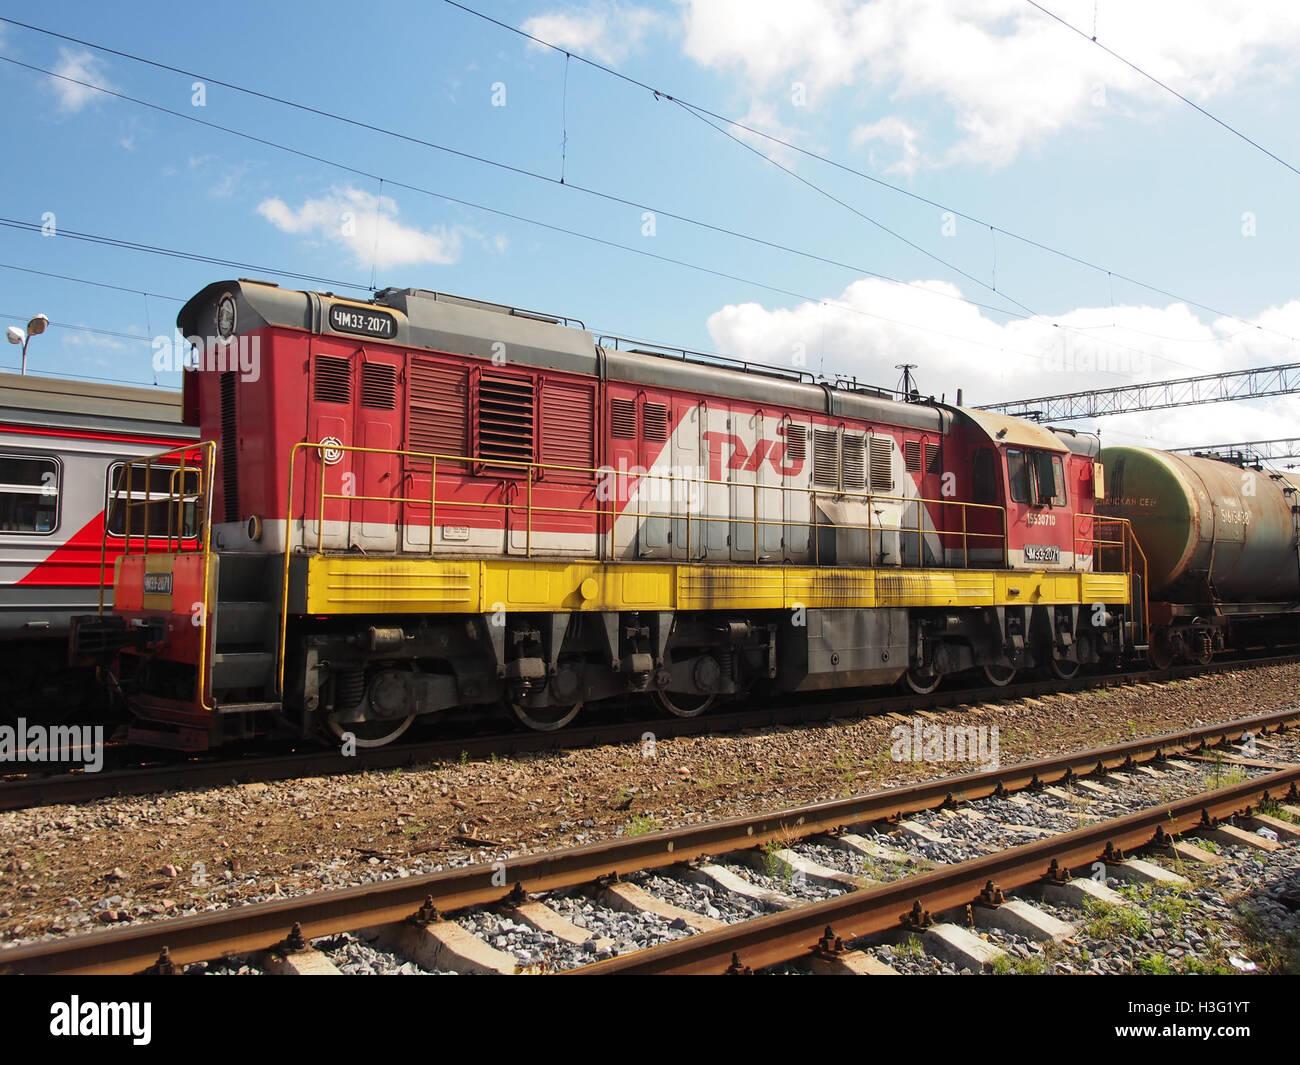 ChME3-2071 at Monino station (2) - Stock Image